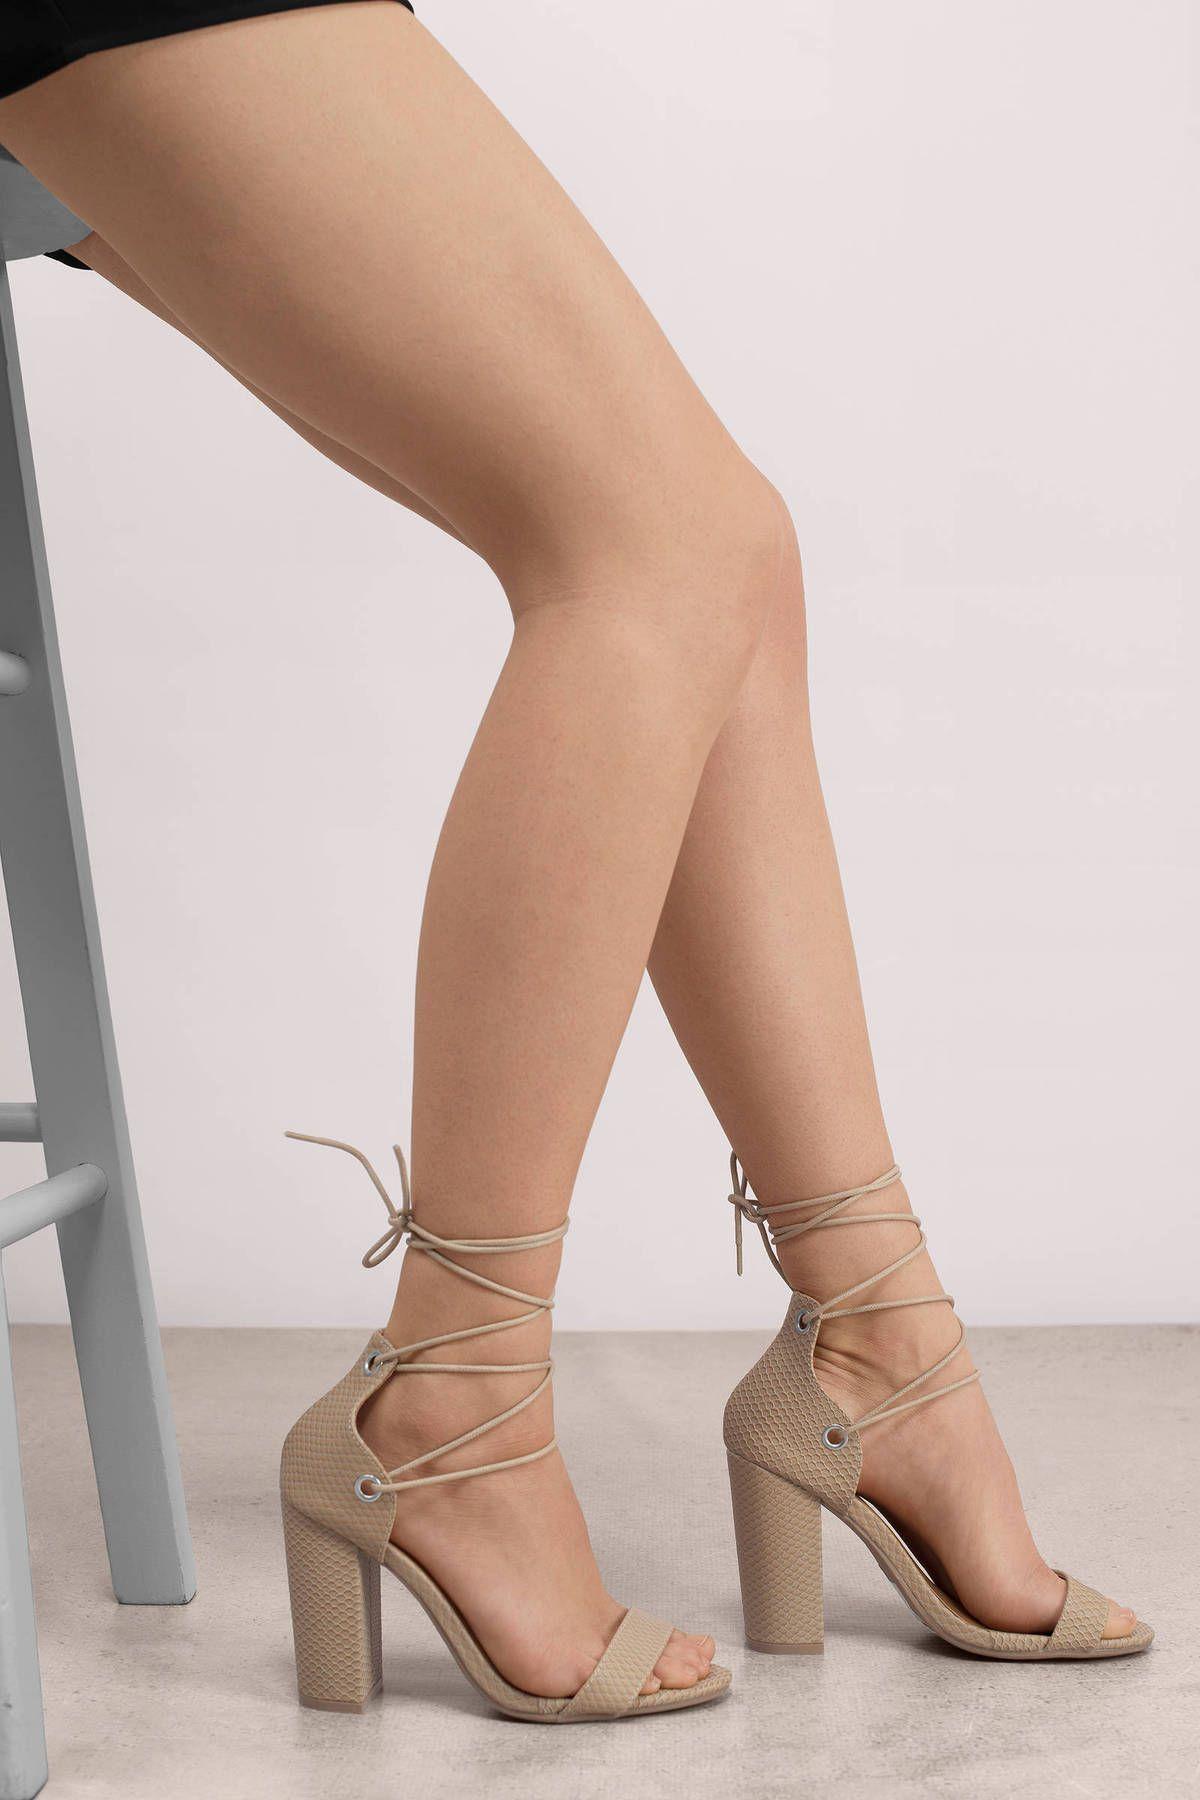 on Jill heels nude